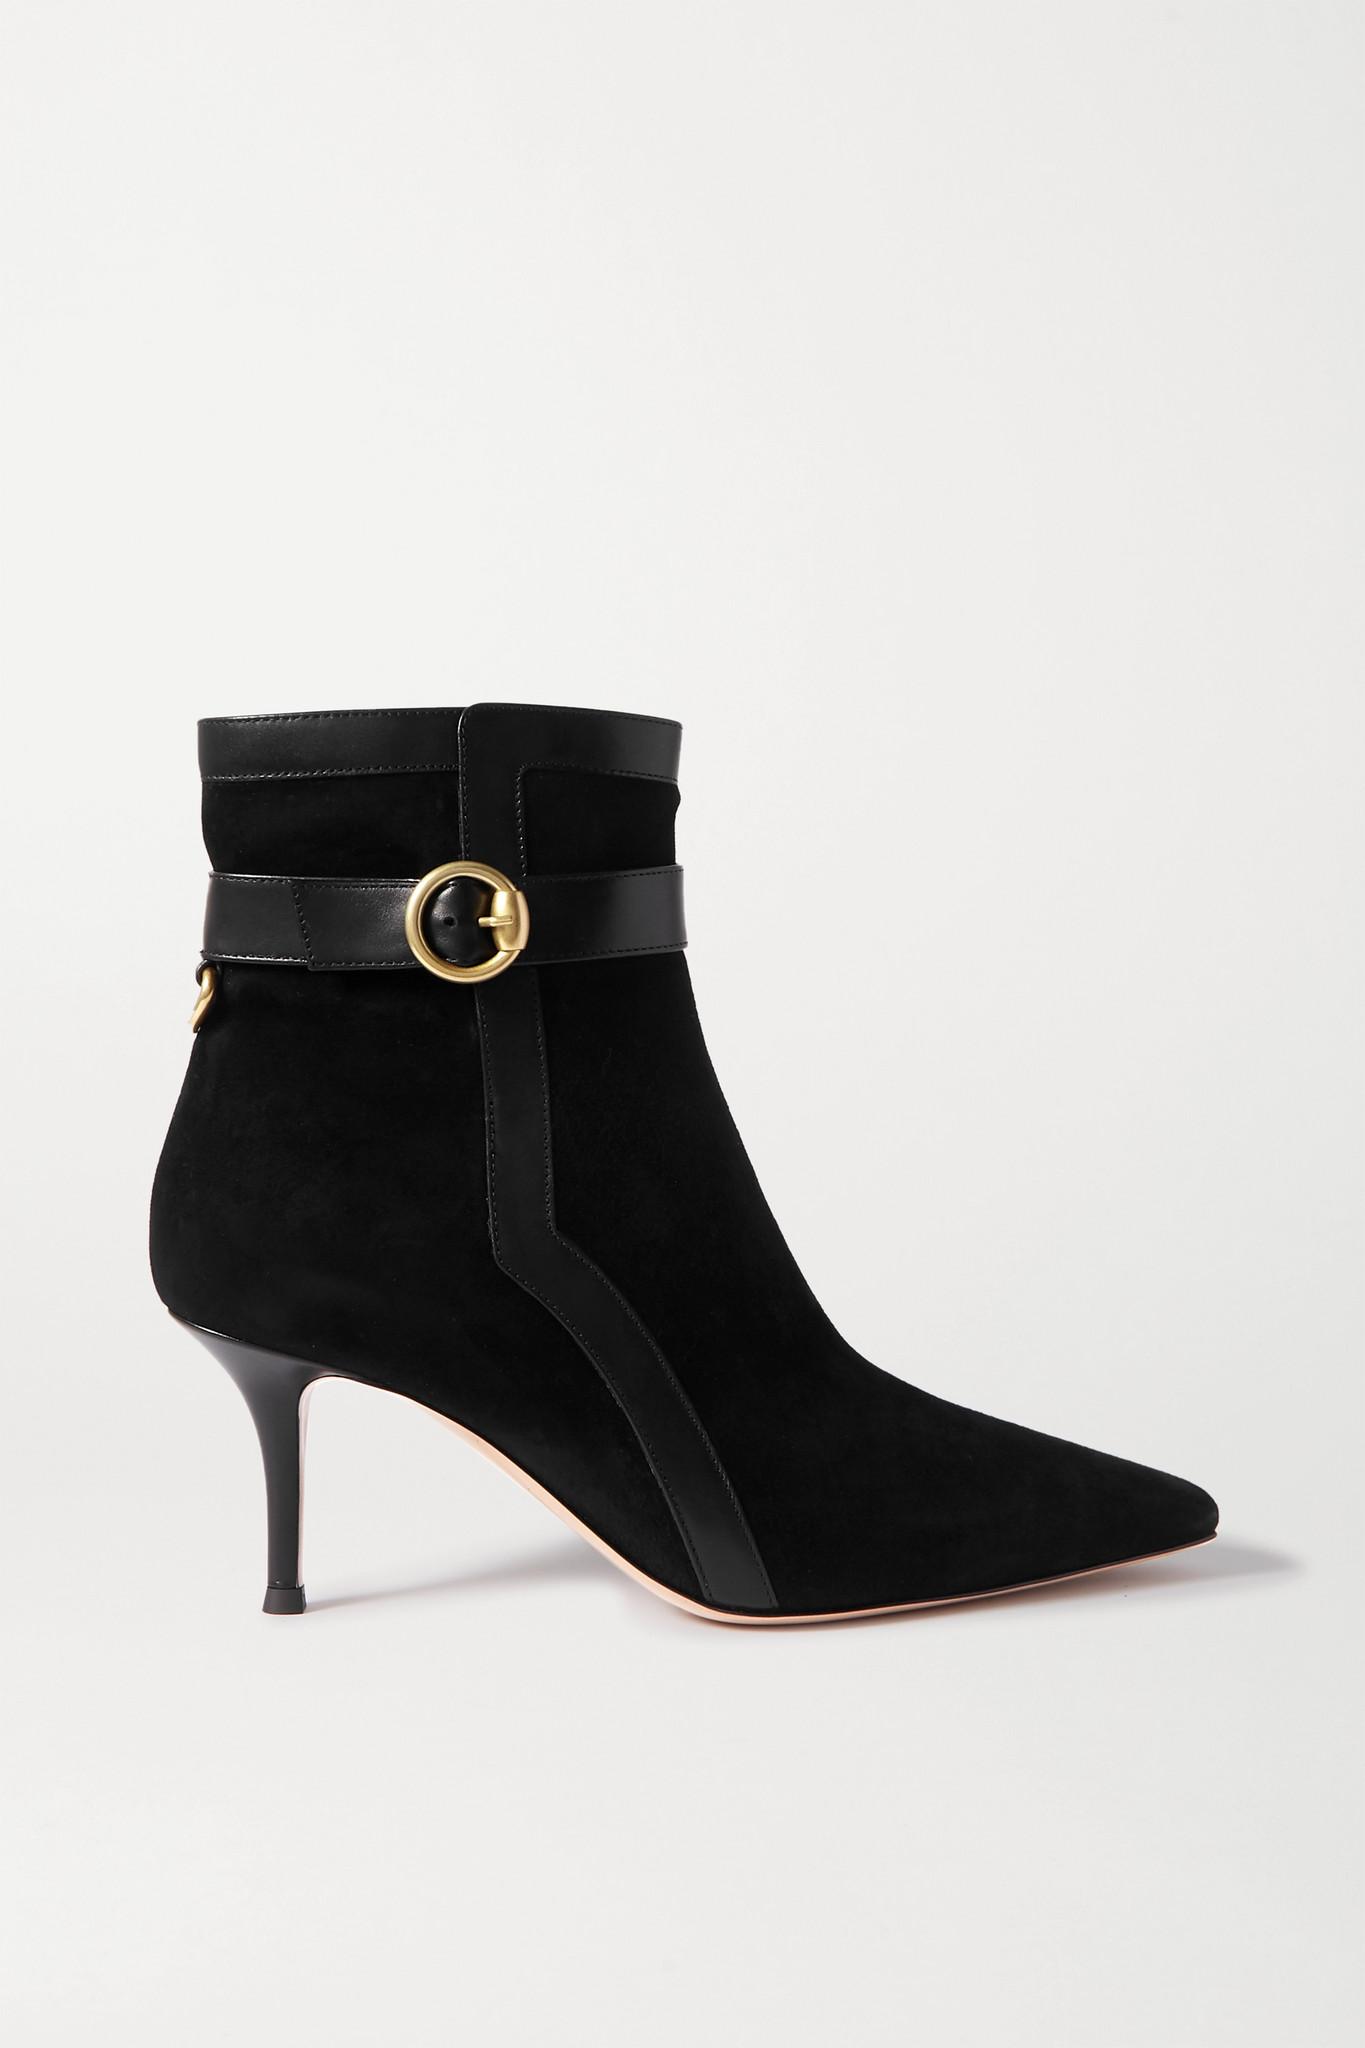 GIANVITO ROSSI - 70 皮革边饰绒面革踝靴 - 黑色 - IT38